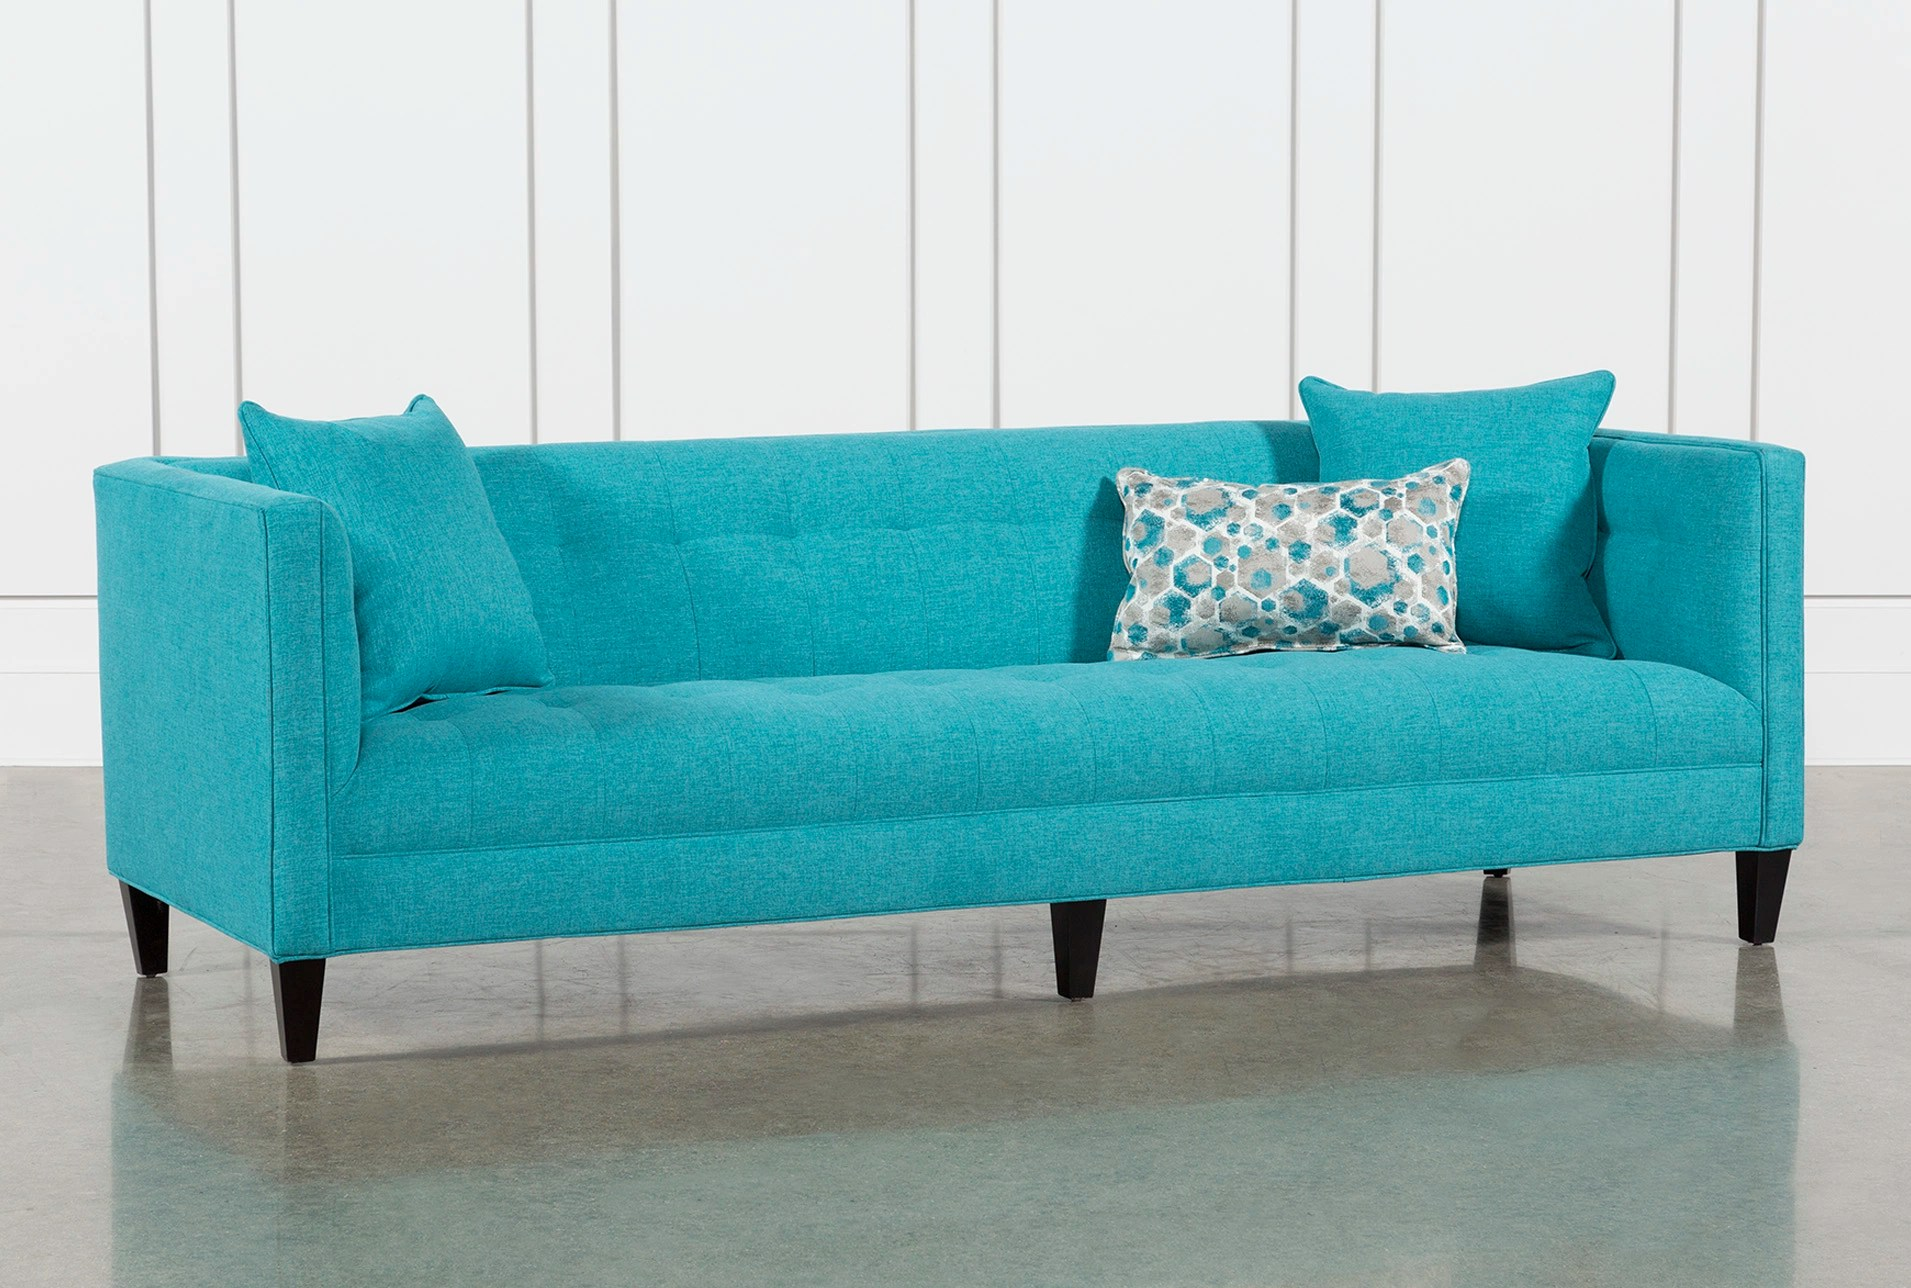 struc walker sofa review tan room ideas milo home the honoroak